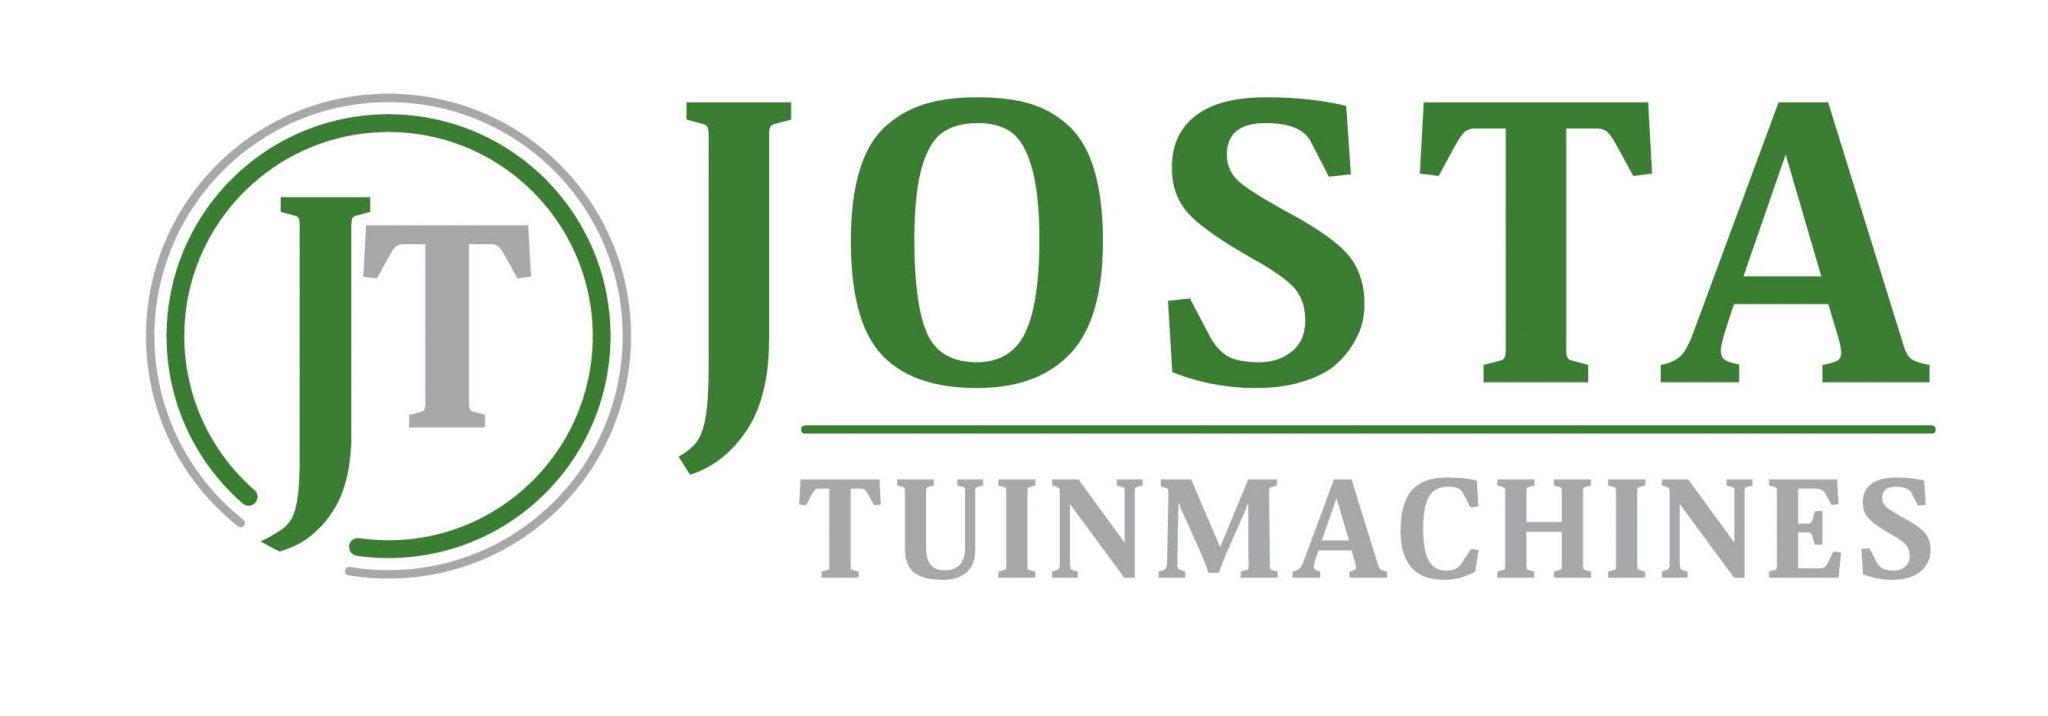 Jostatuinmachines.nl